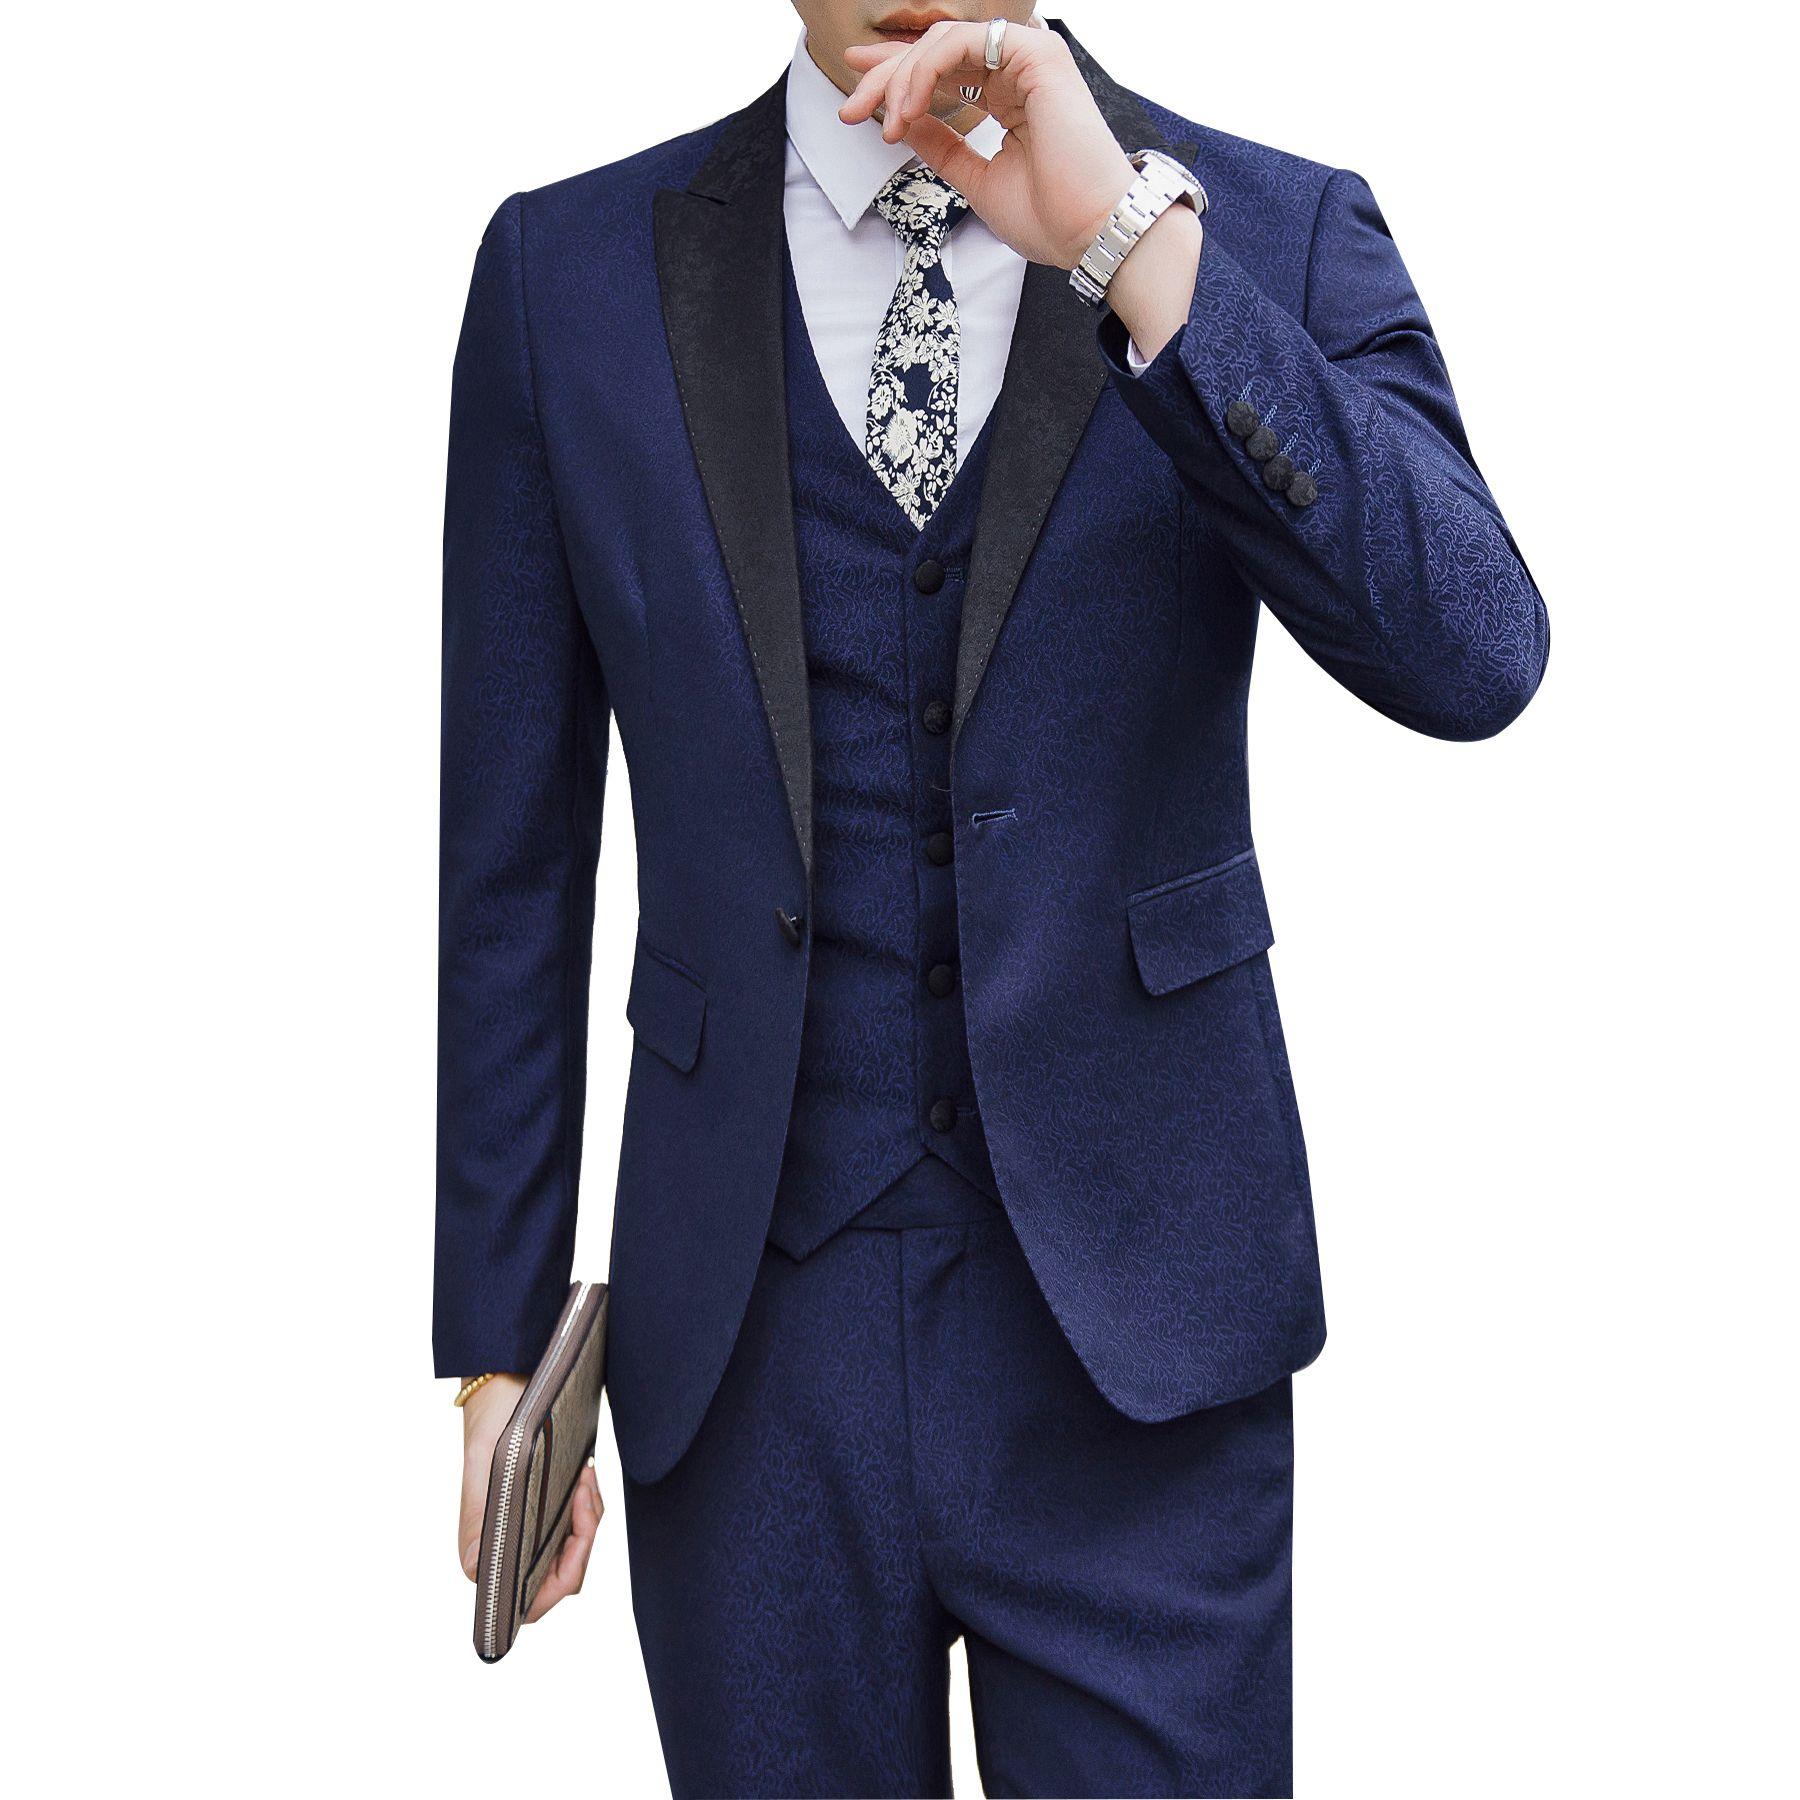 K:2158 Cool In Summer And Warm In Winter jacket+pants+tie Professional Sale Recently Design Black Mens Suits Groom Tuxedos Groomsmen Wedding Party Dinner Best Man Suits Blazer